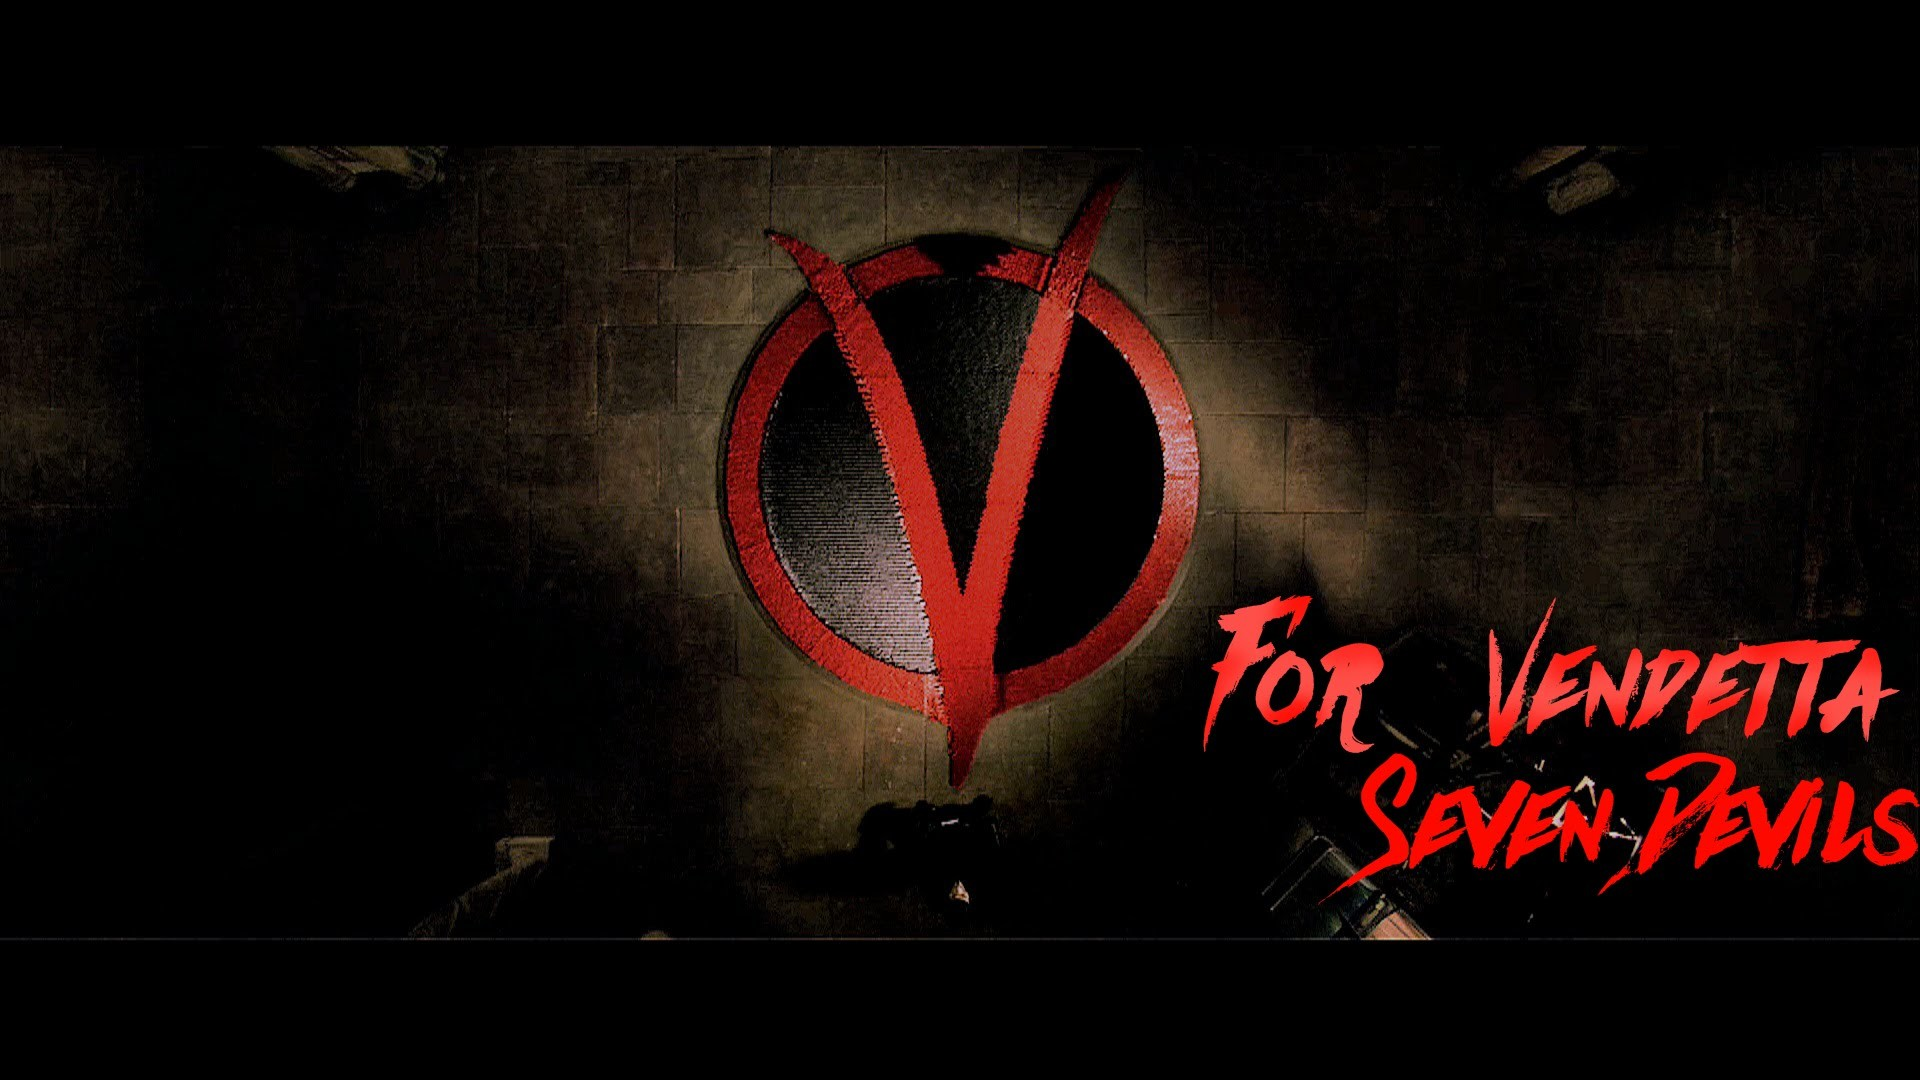 V for Vendetta – Seven devils